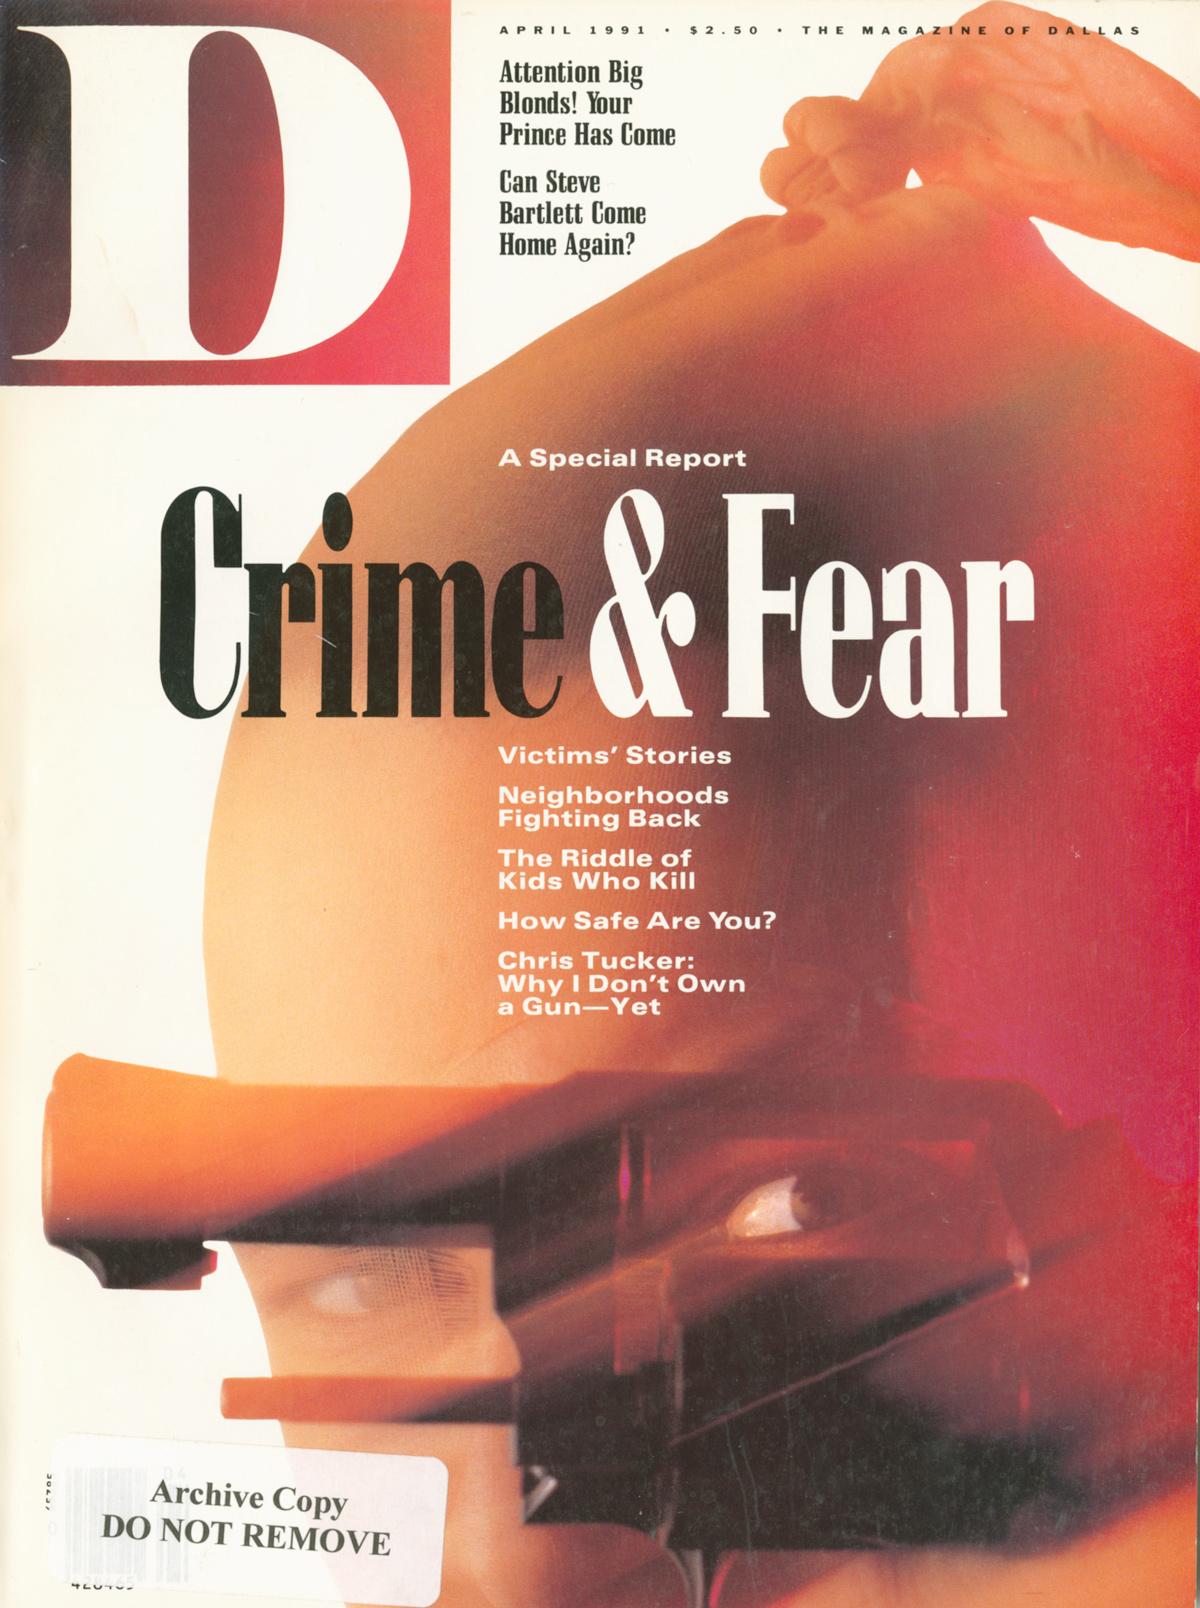 April 1991 cover